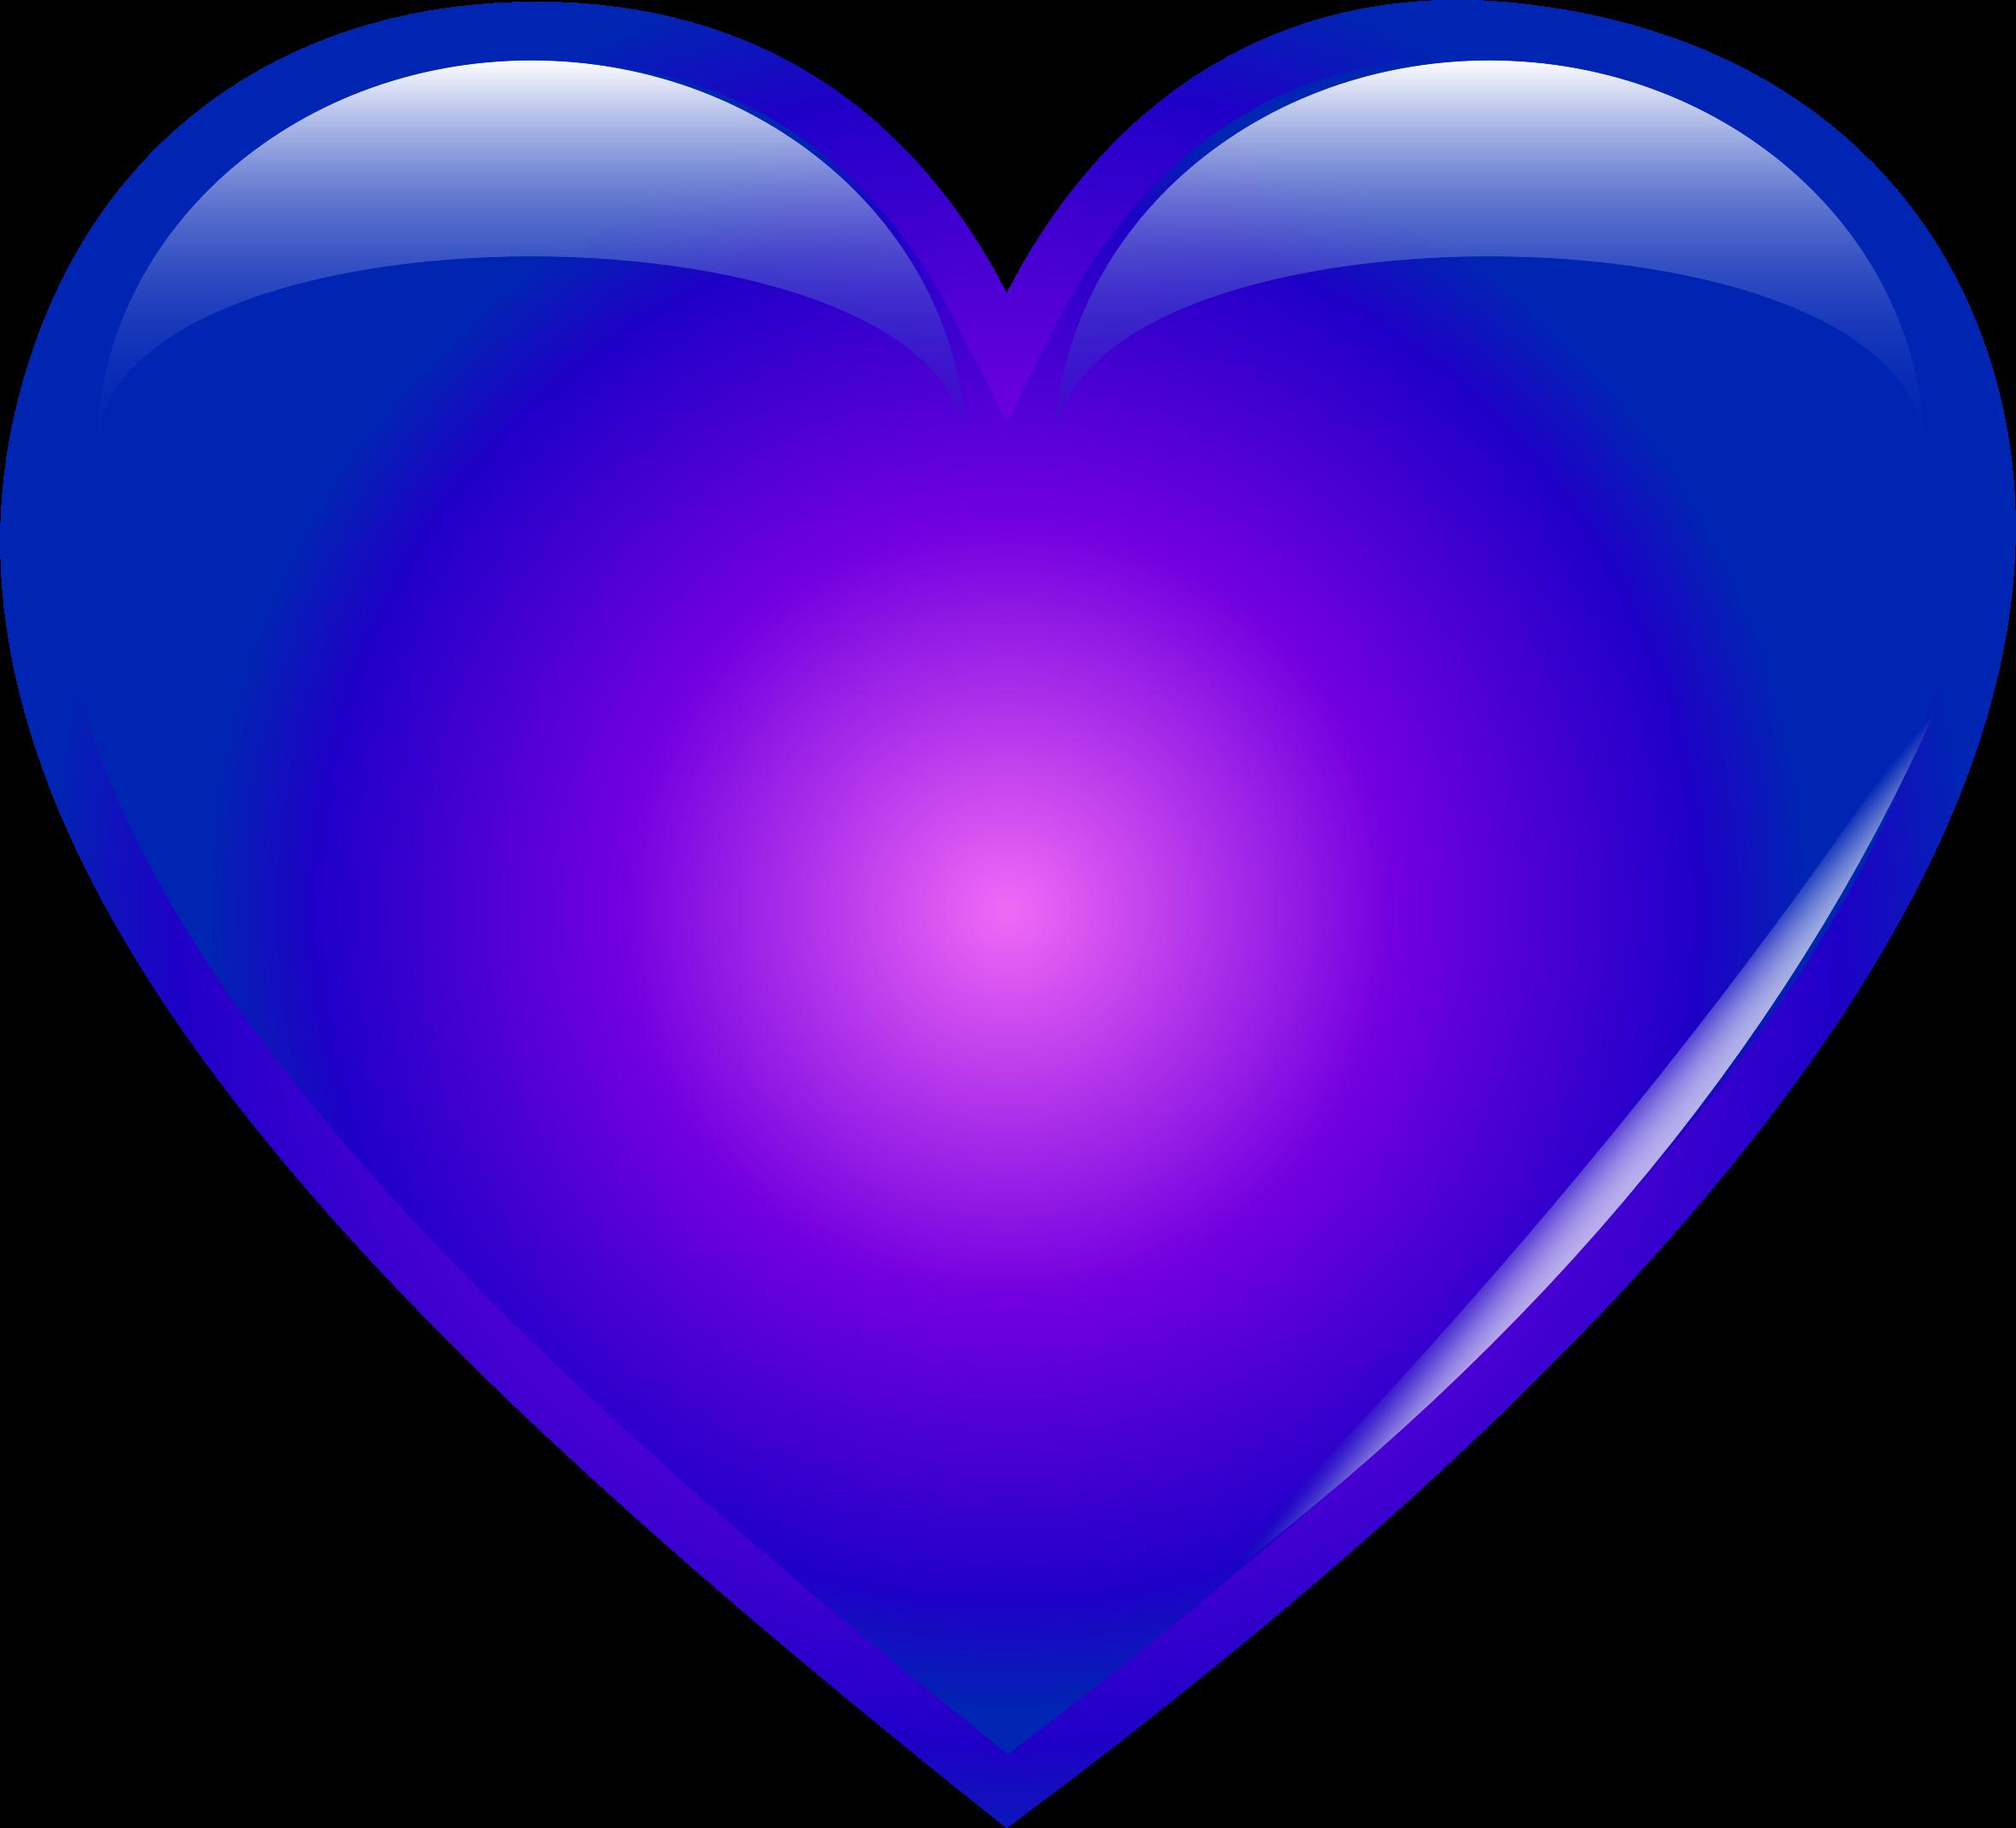 Blue heart clipart transparent image royalty free Clipart - Blue Heart image royalty free